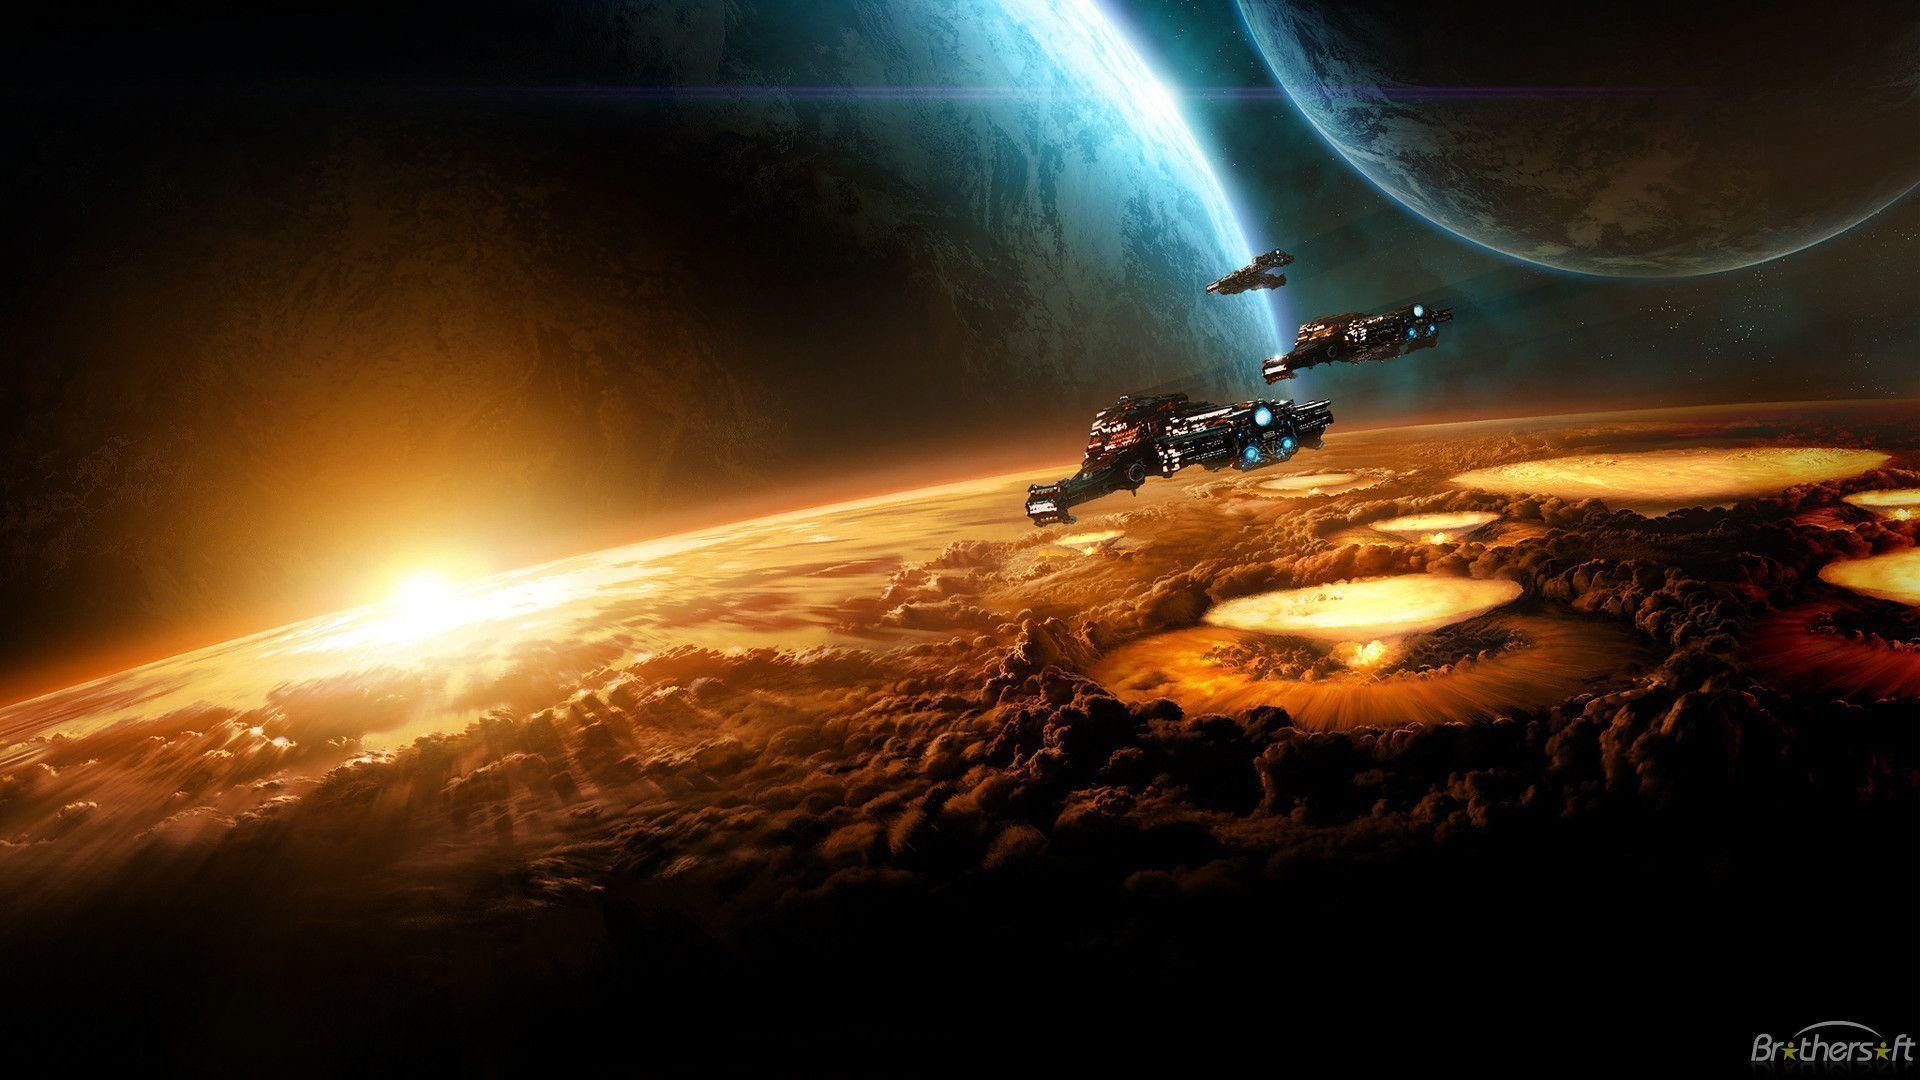 Starcraft 2 Wallpaper 1920x1080 82 Images